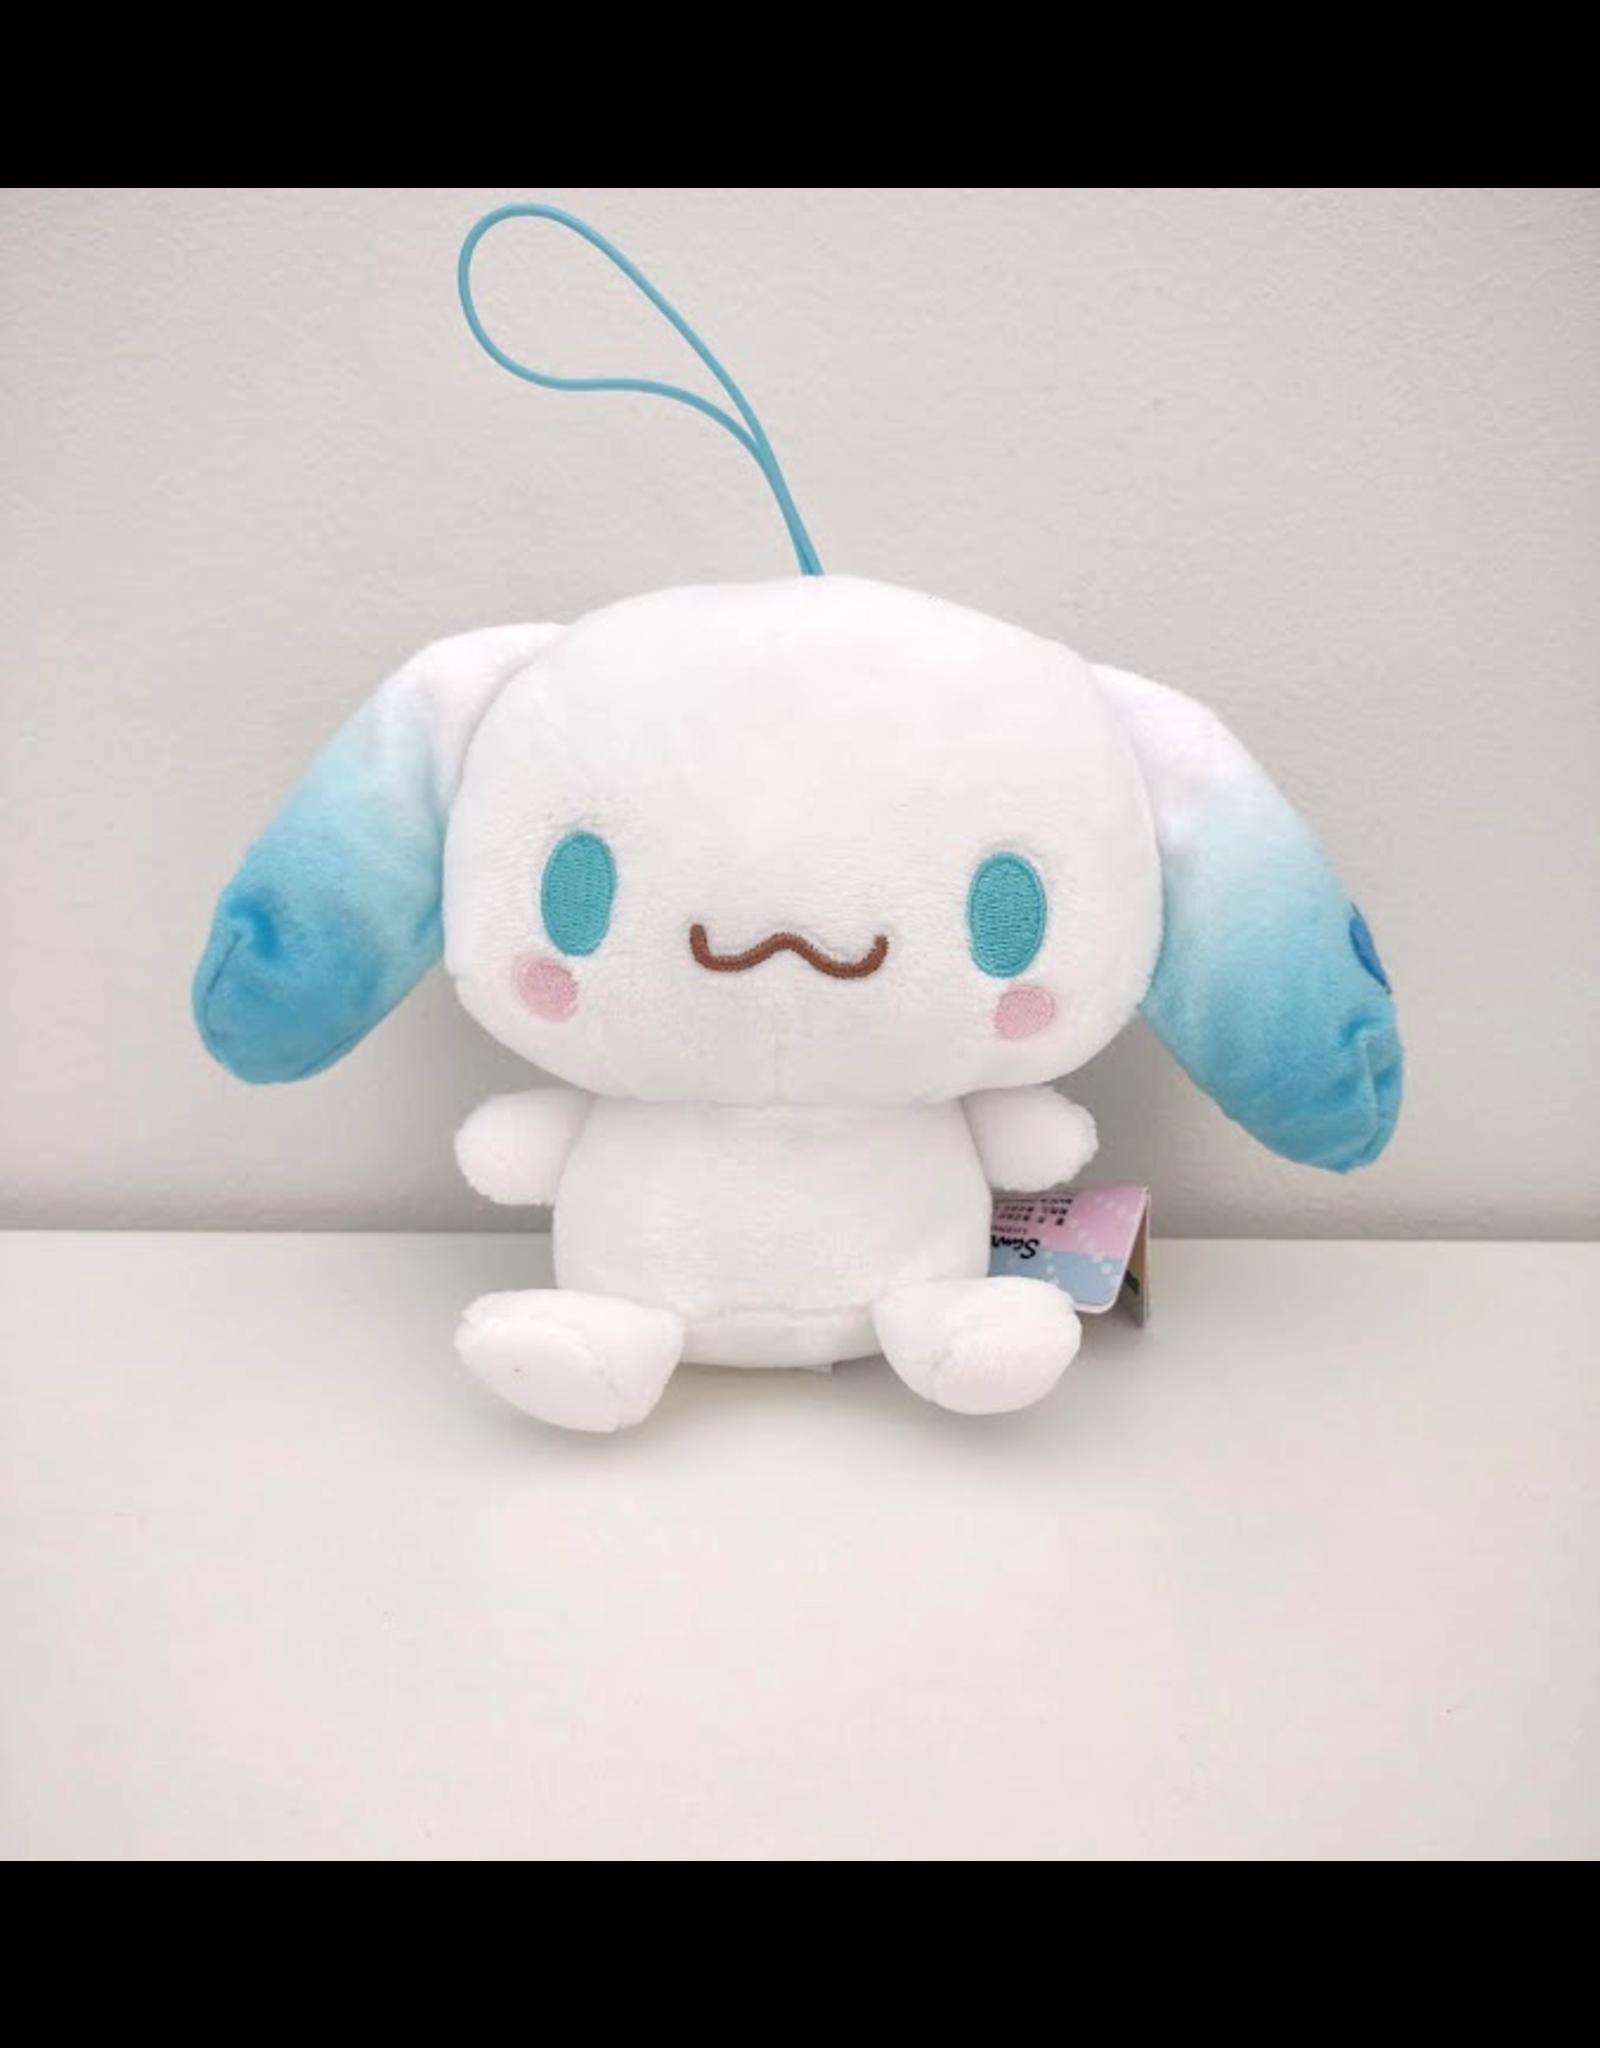 Sanrio Cinnamoroll - Yumekawa Fancy Color Plush - 12 cm - Light Blue